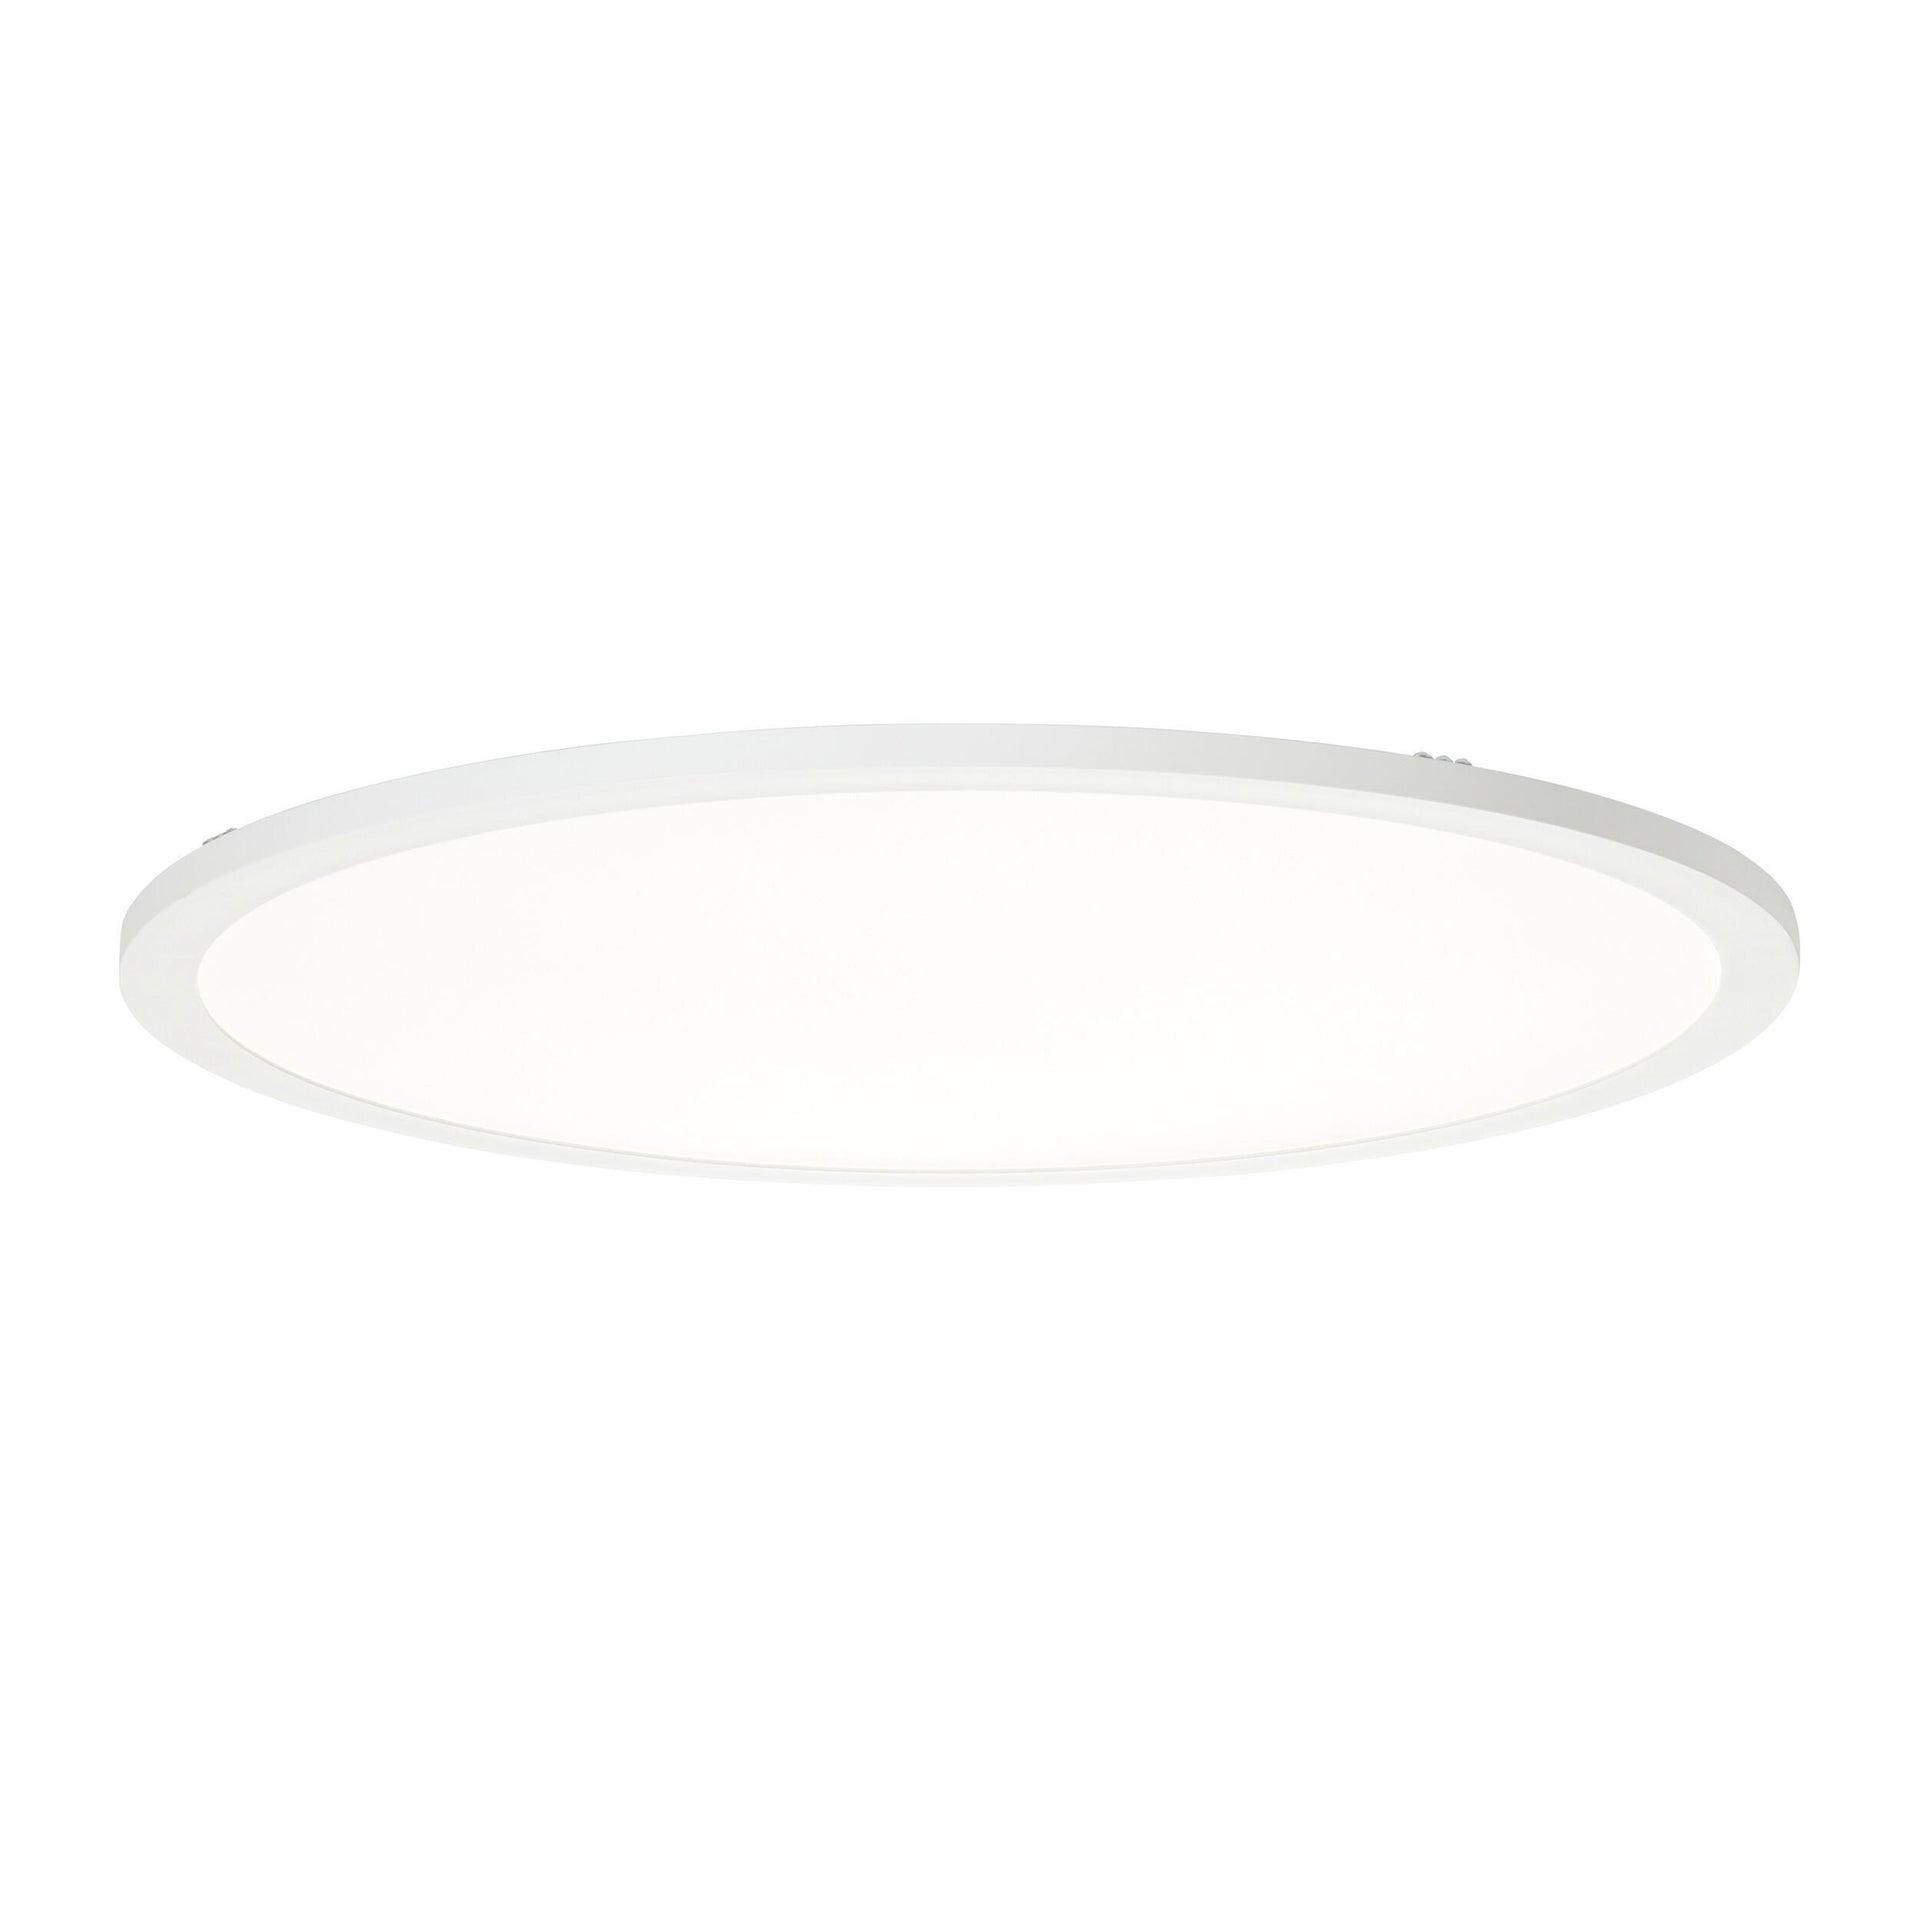 Pannello led Abie Ø 60 cm, cct regolazione da bianco caldo a bianco freddo, 3300LM - 4